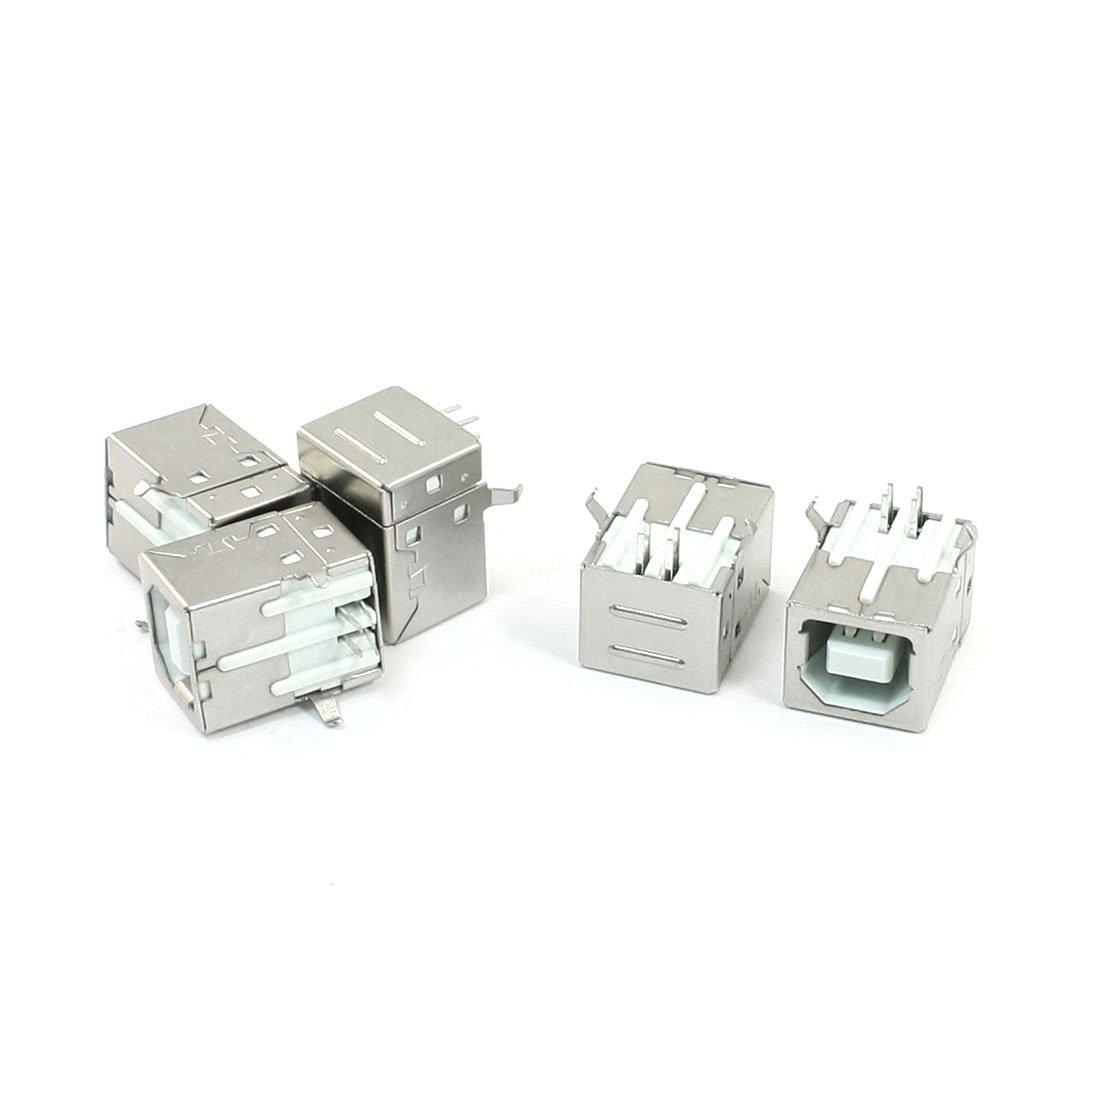 uxcell/® 10pcs USB 2.0 Type B Socket Jack 4 Pins 180 Degree Female Connector